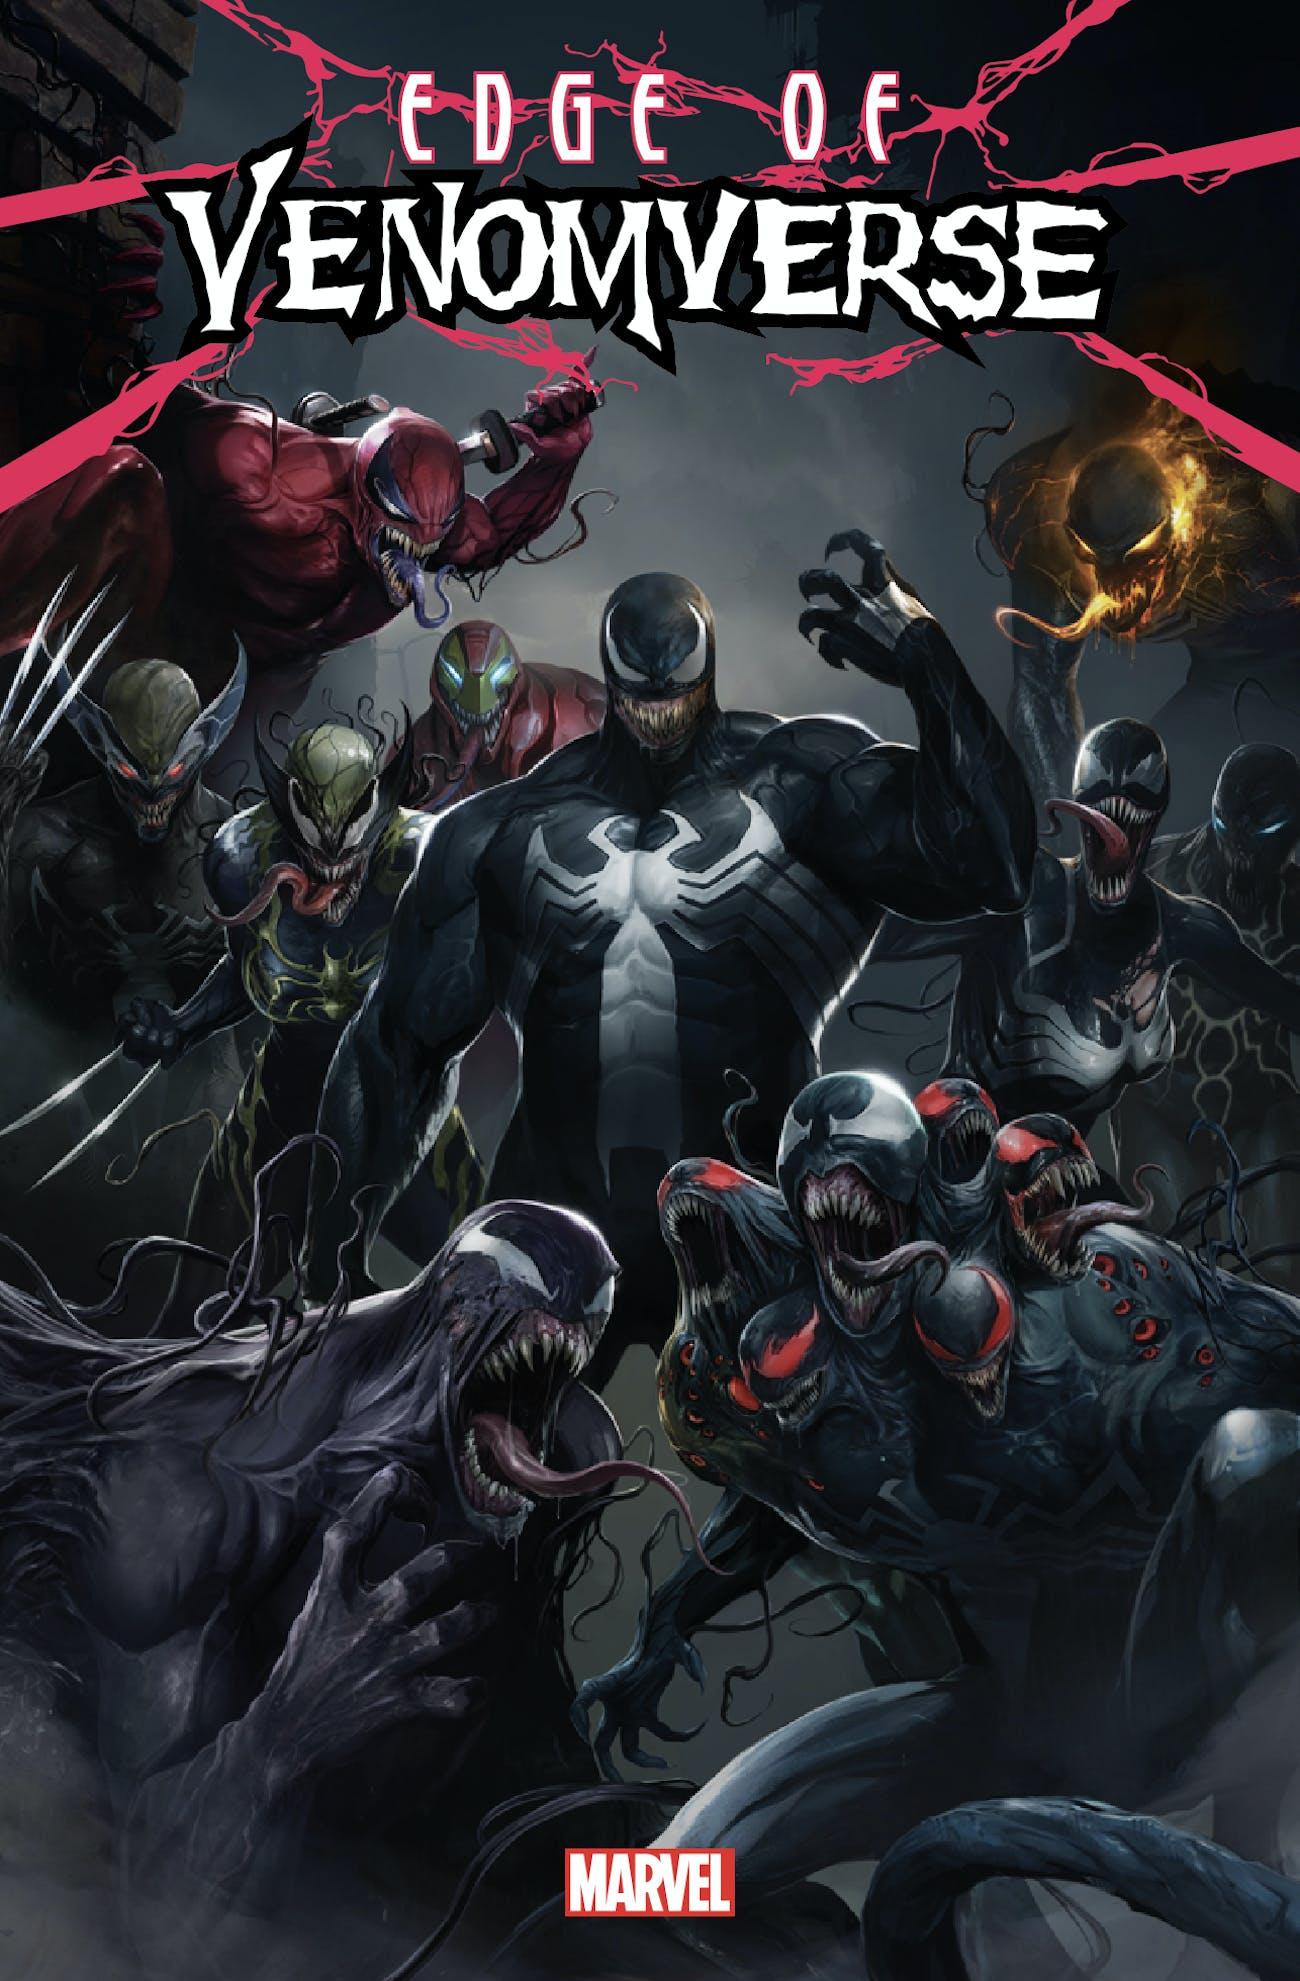 Edge of Venomverse Venom